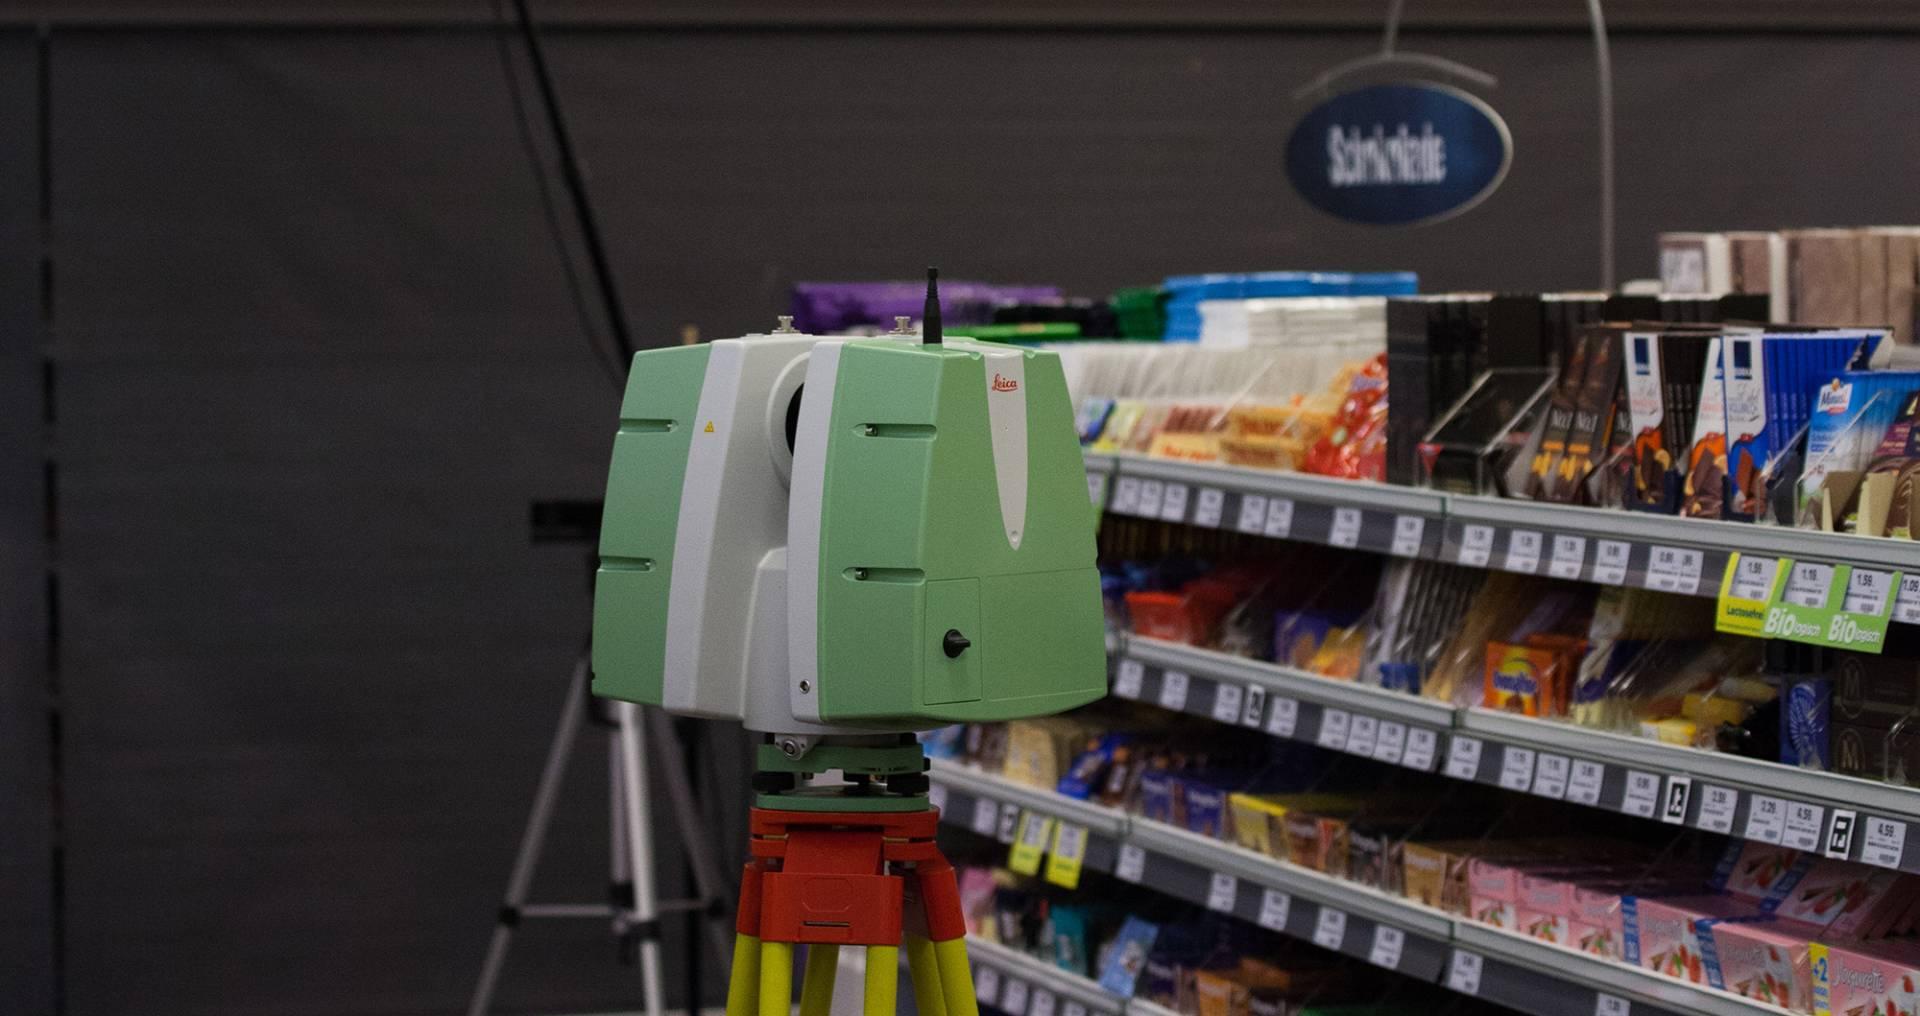 Laserscanner - Leica - Forschung - Multisensorik - Creative Technology - POS - Supermarkt - Gesture Tracking - Emotion Tracking - Biomotion - realtime visions